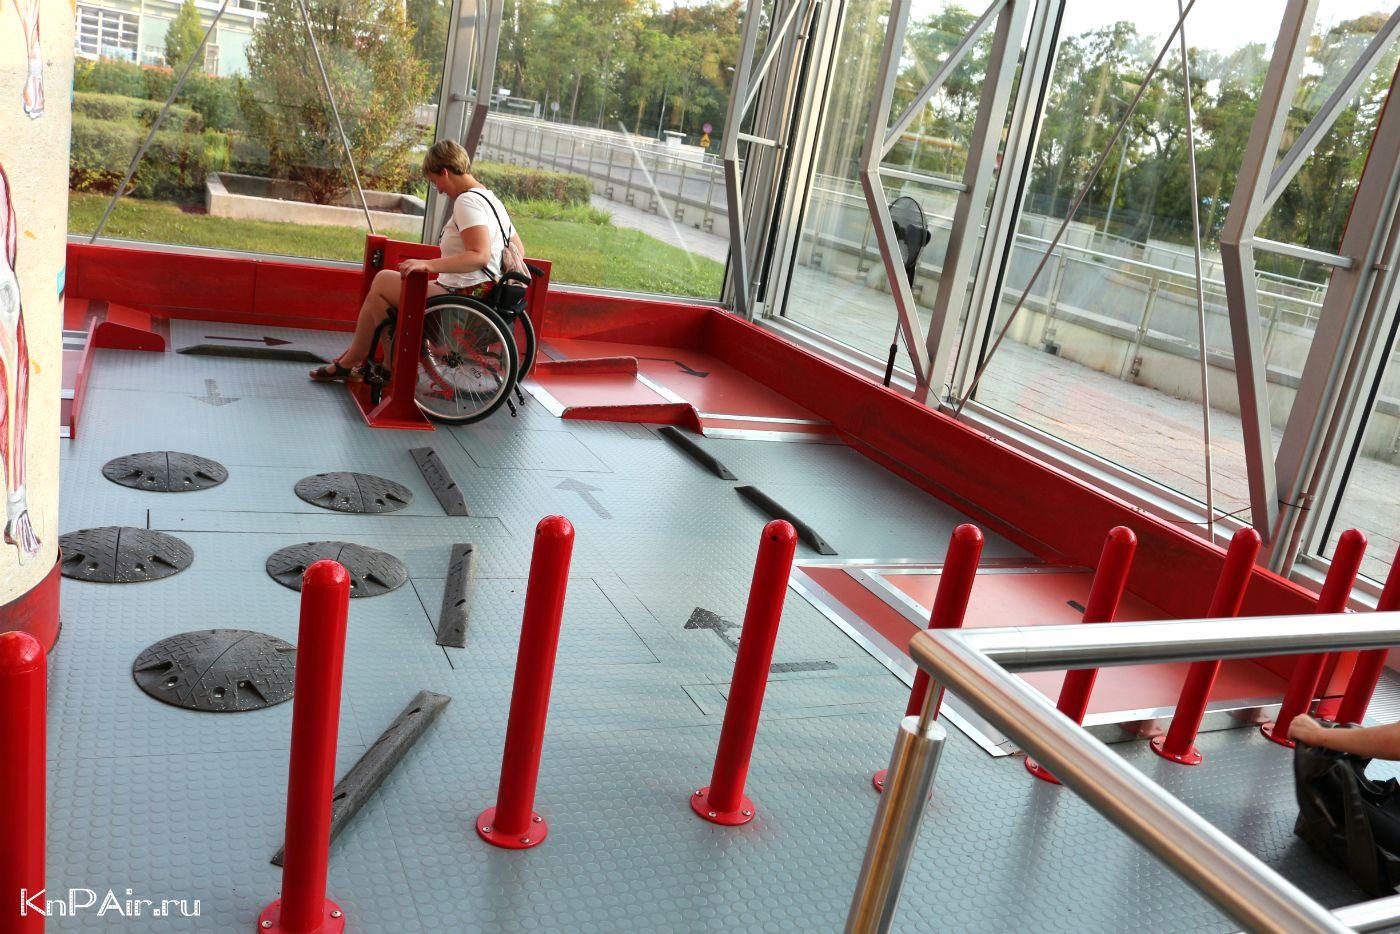 kak-byt-invalidom-muzei-nauki